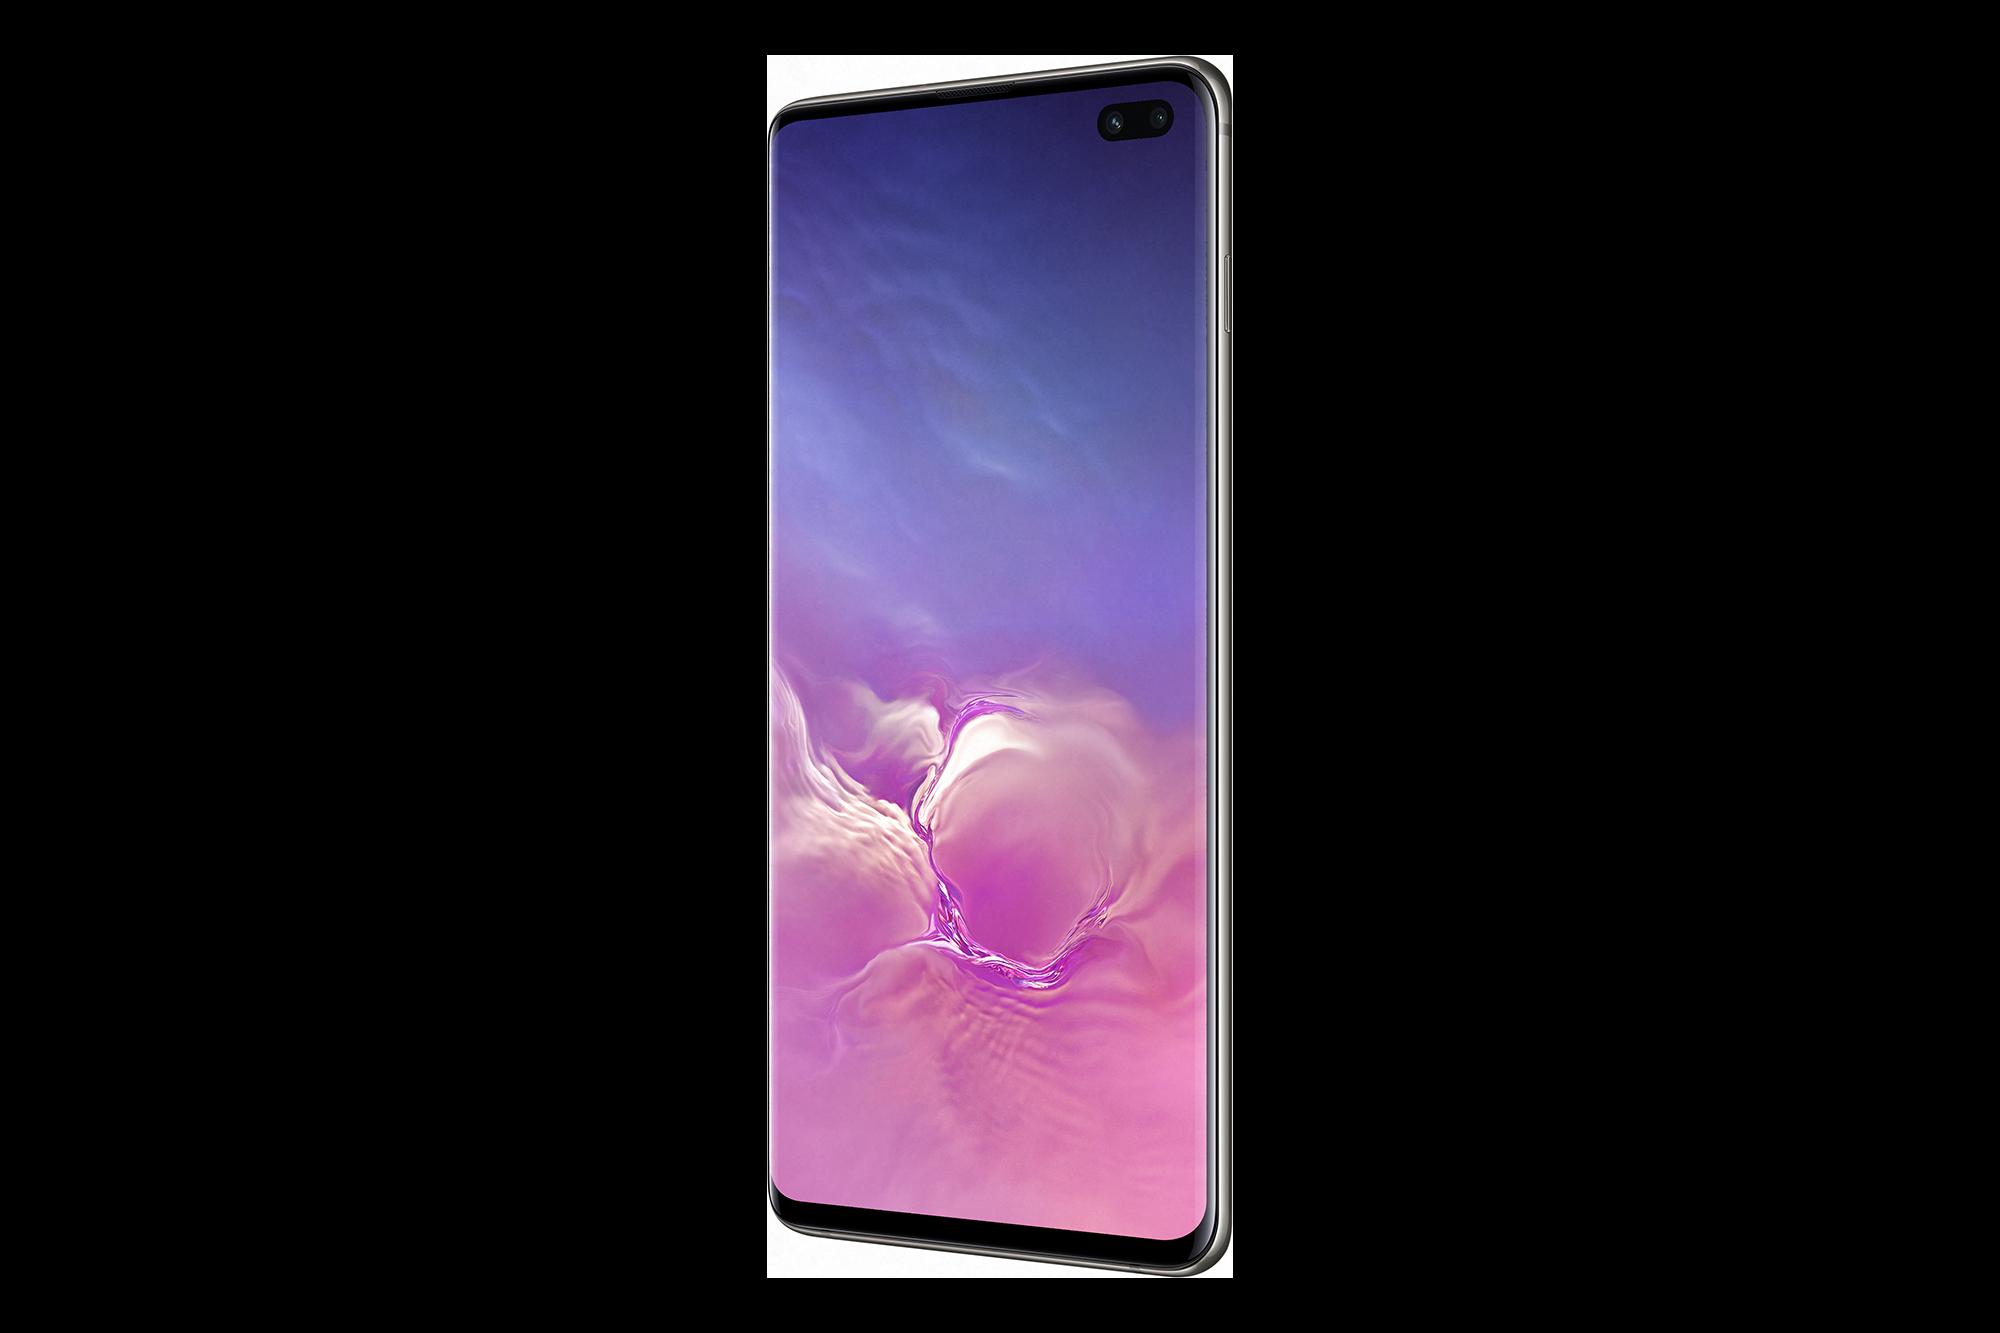 Samsung Galaxy S10 Ceramic Black Side PNG Image.